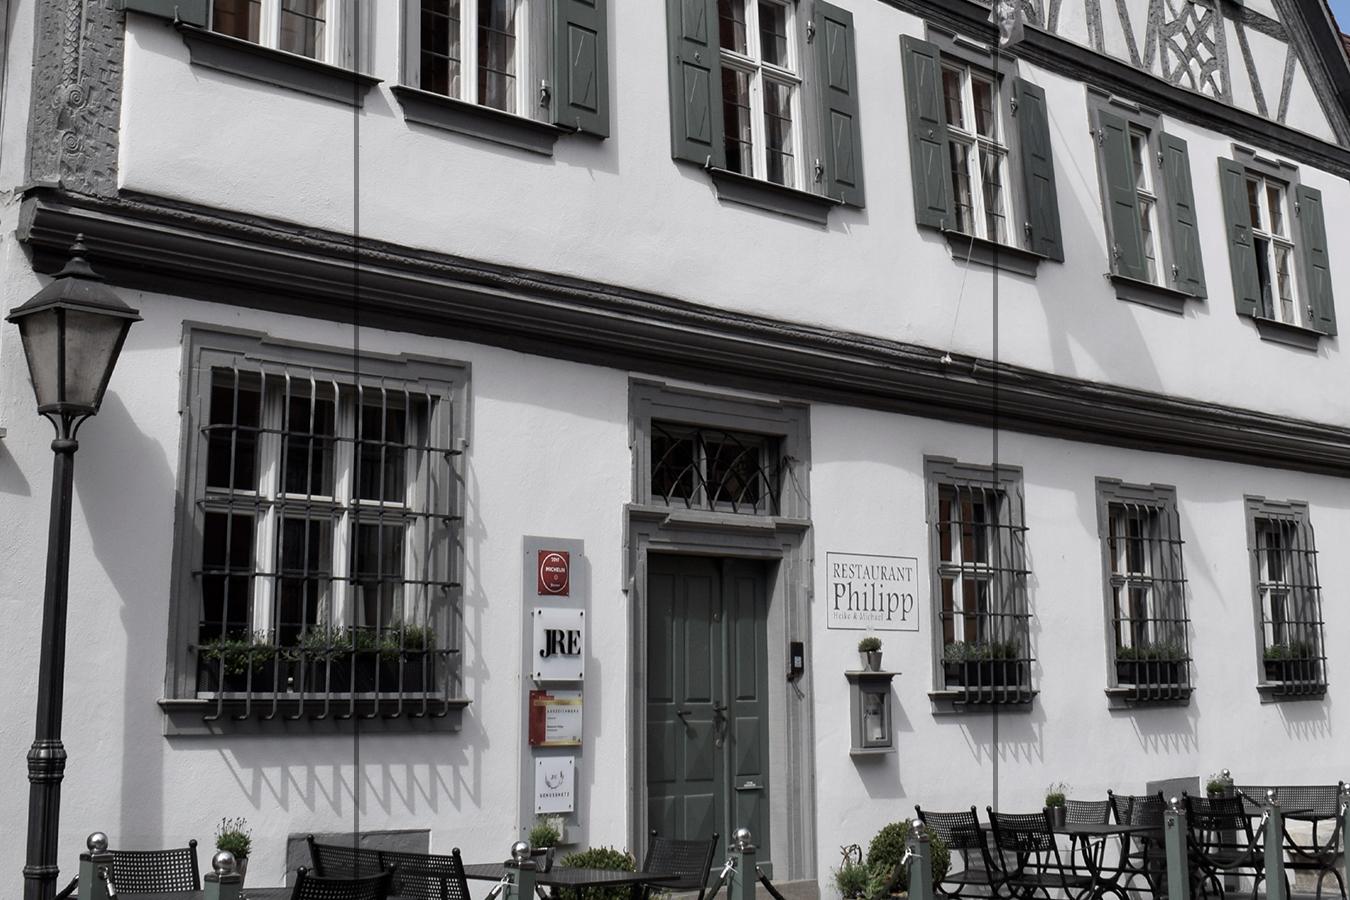 Restaurant Philipp in Sommerhausen am Main in Unterfranken